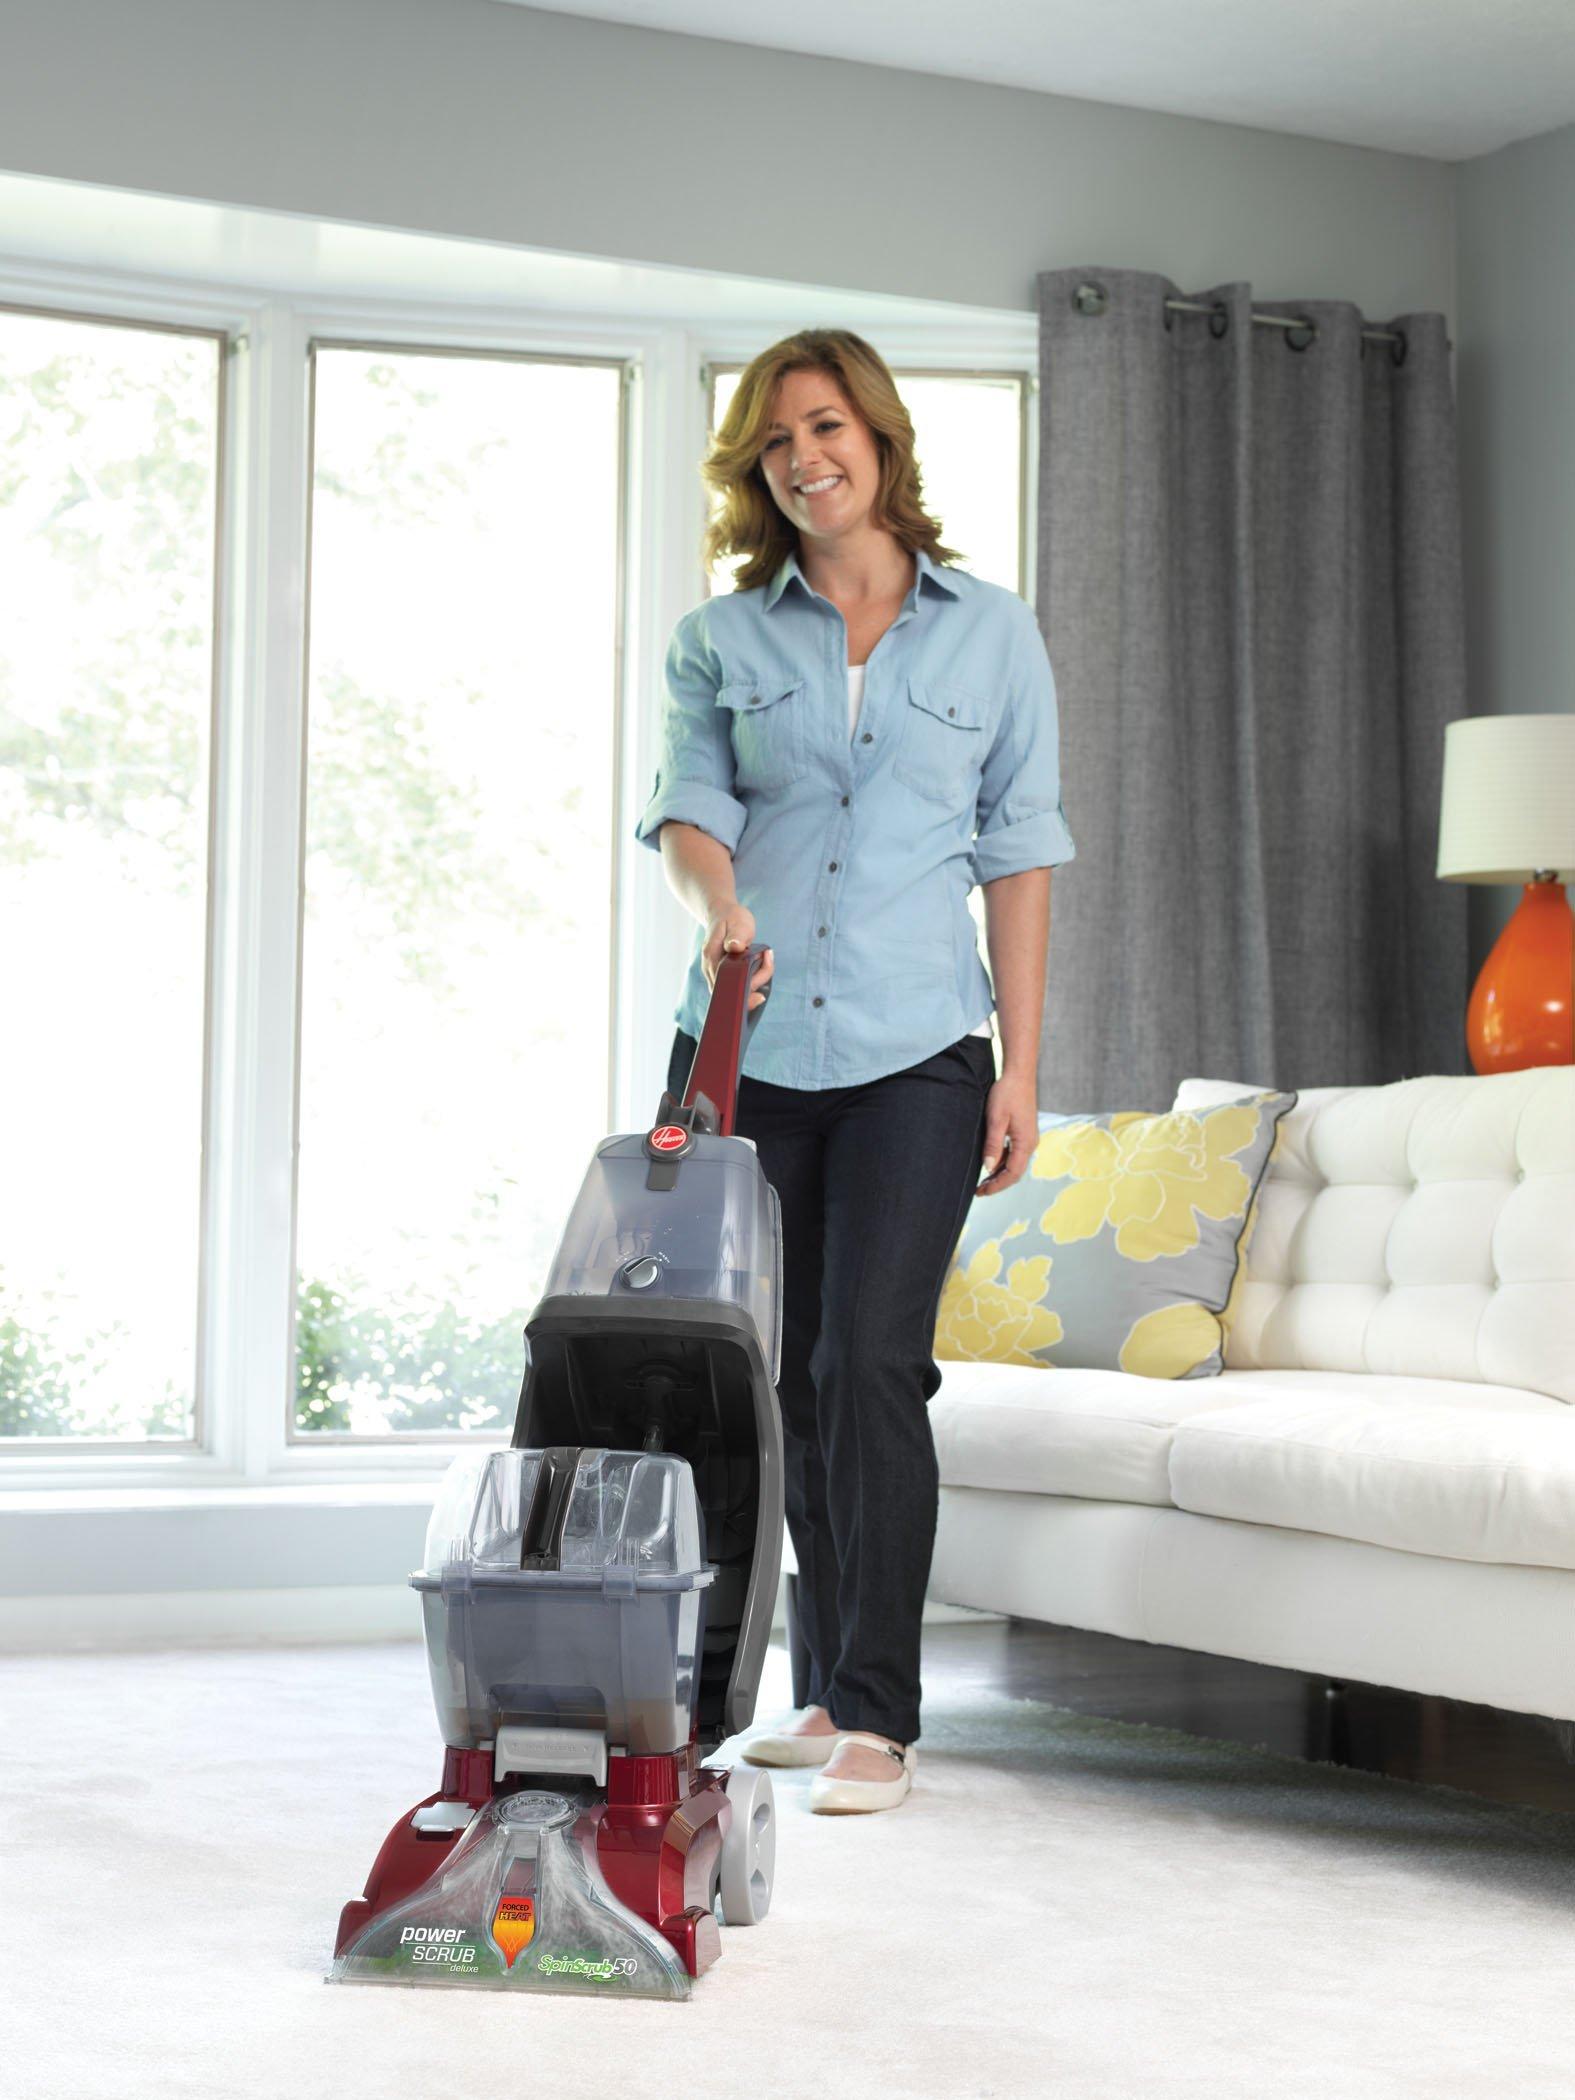 Hoover® Power Scrub Deluxe Carpet Cleaner3